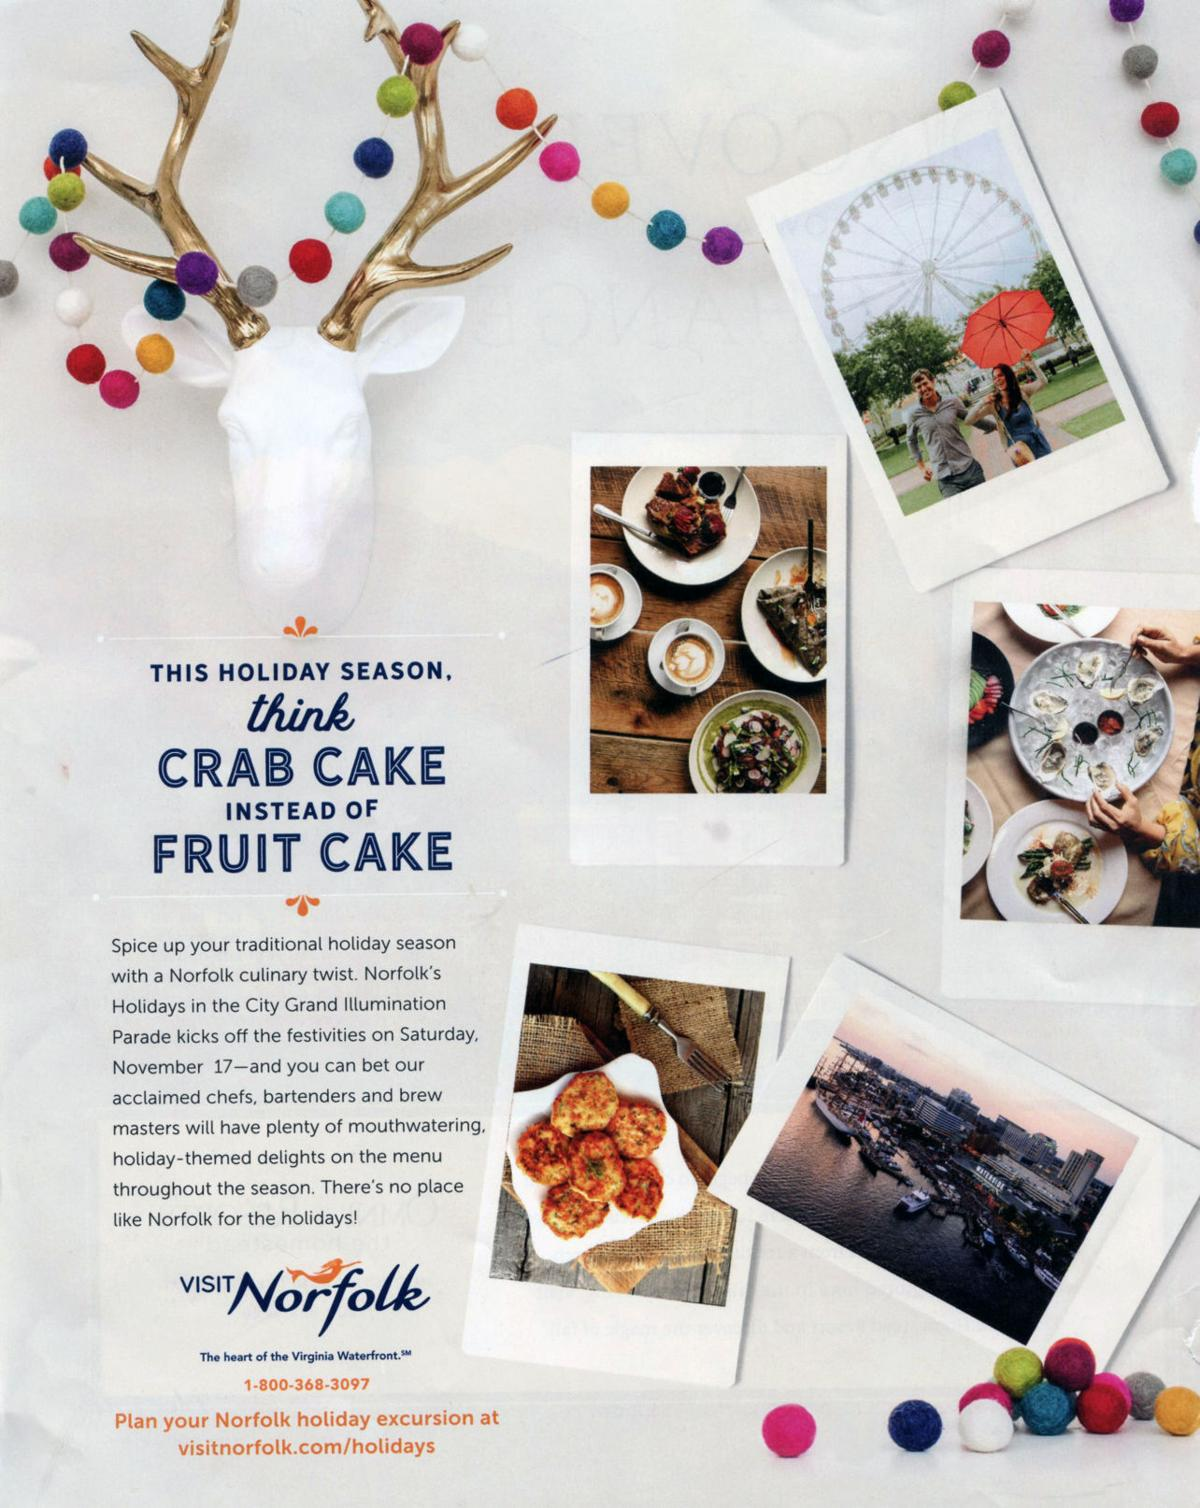 11-10-18 Crab Cakes.jpg